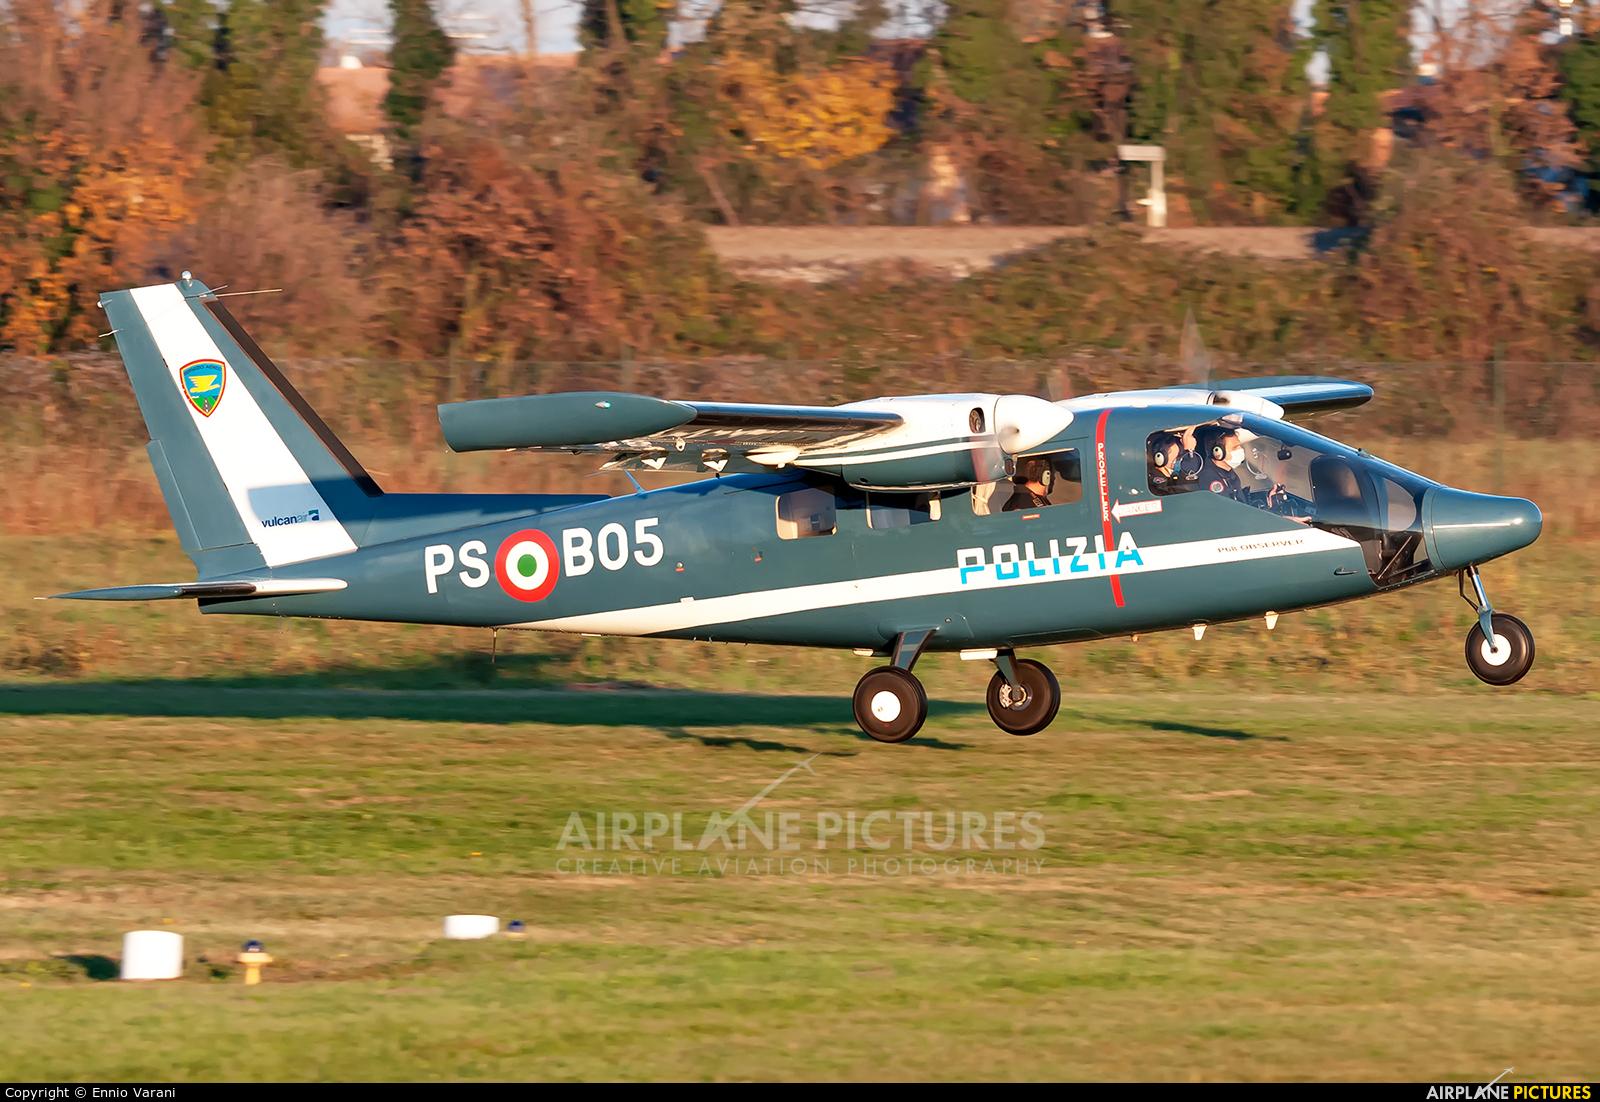 Italy - Police PS-B05 aircraft at Thiene - Arturo Ferrarin